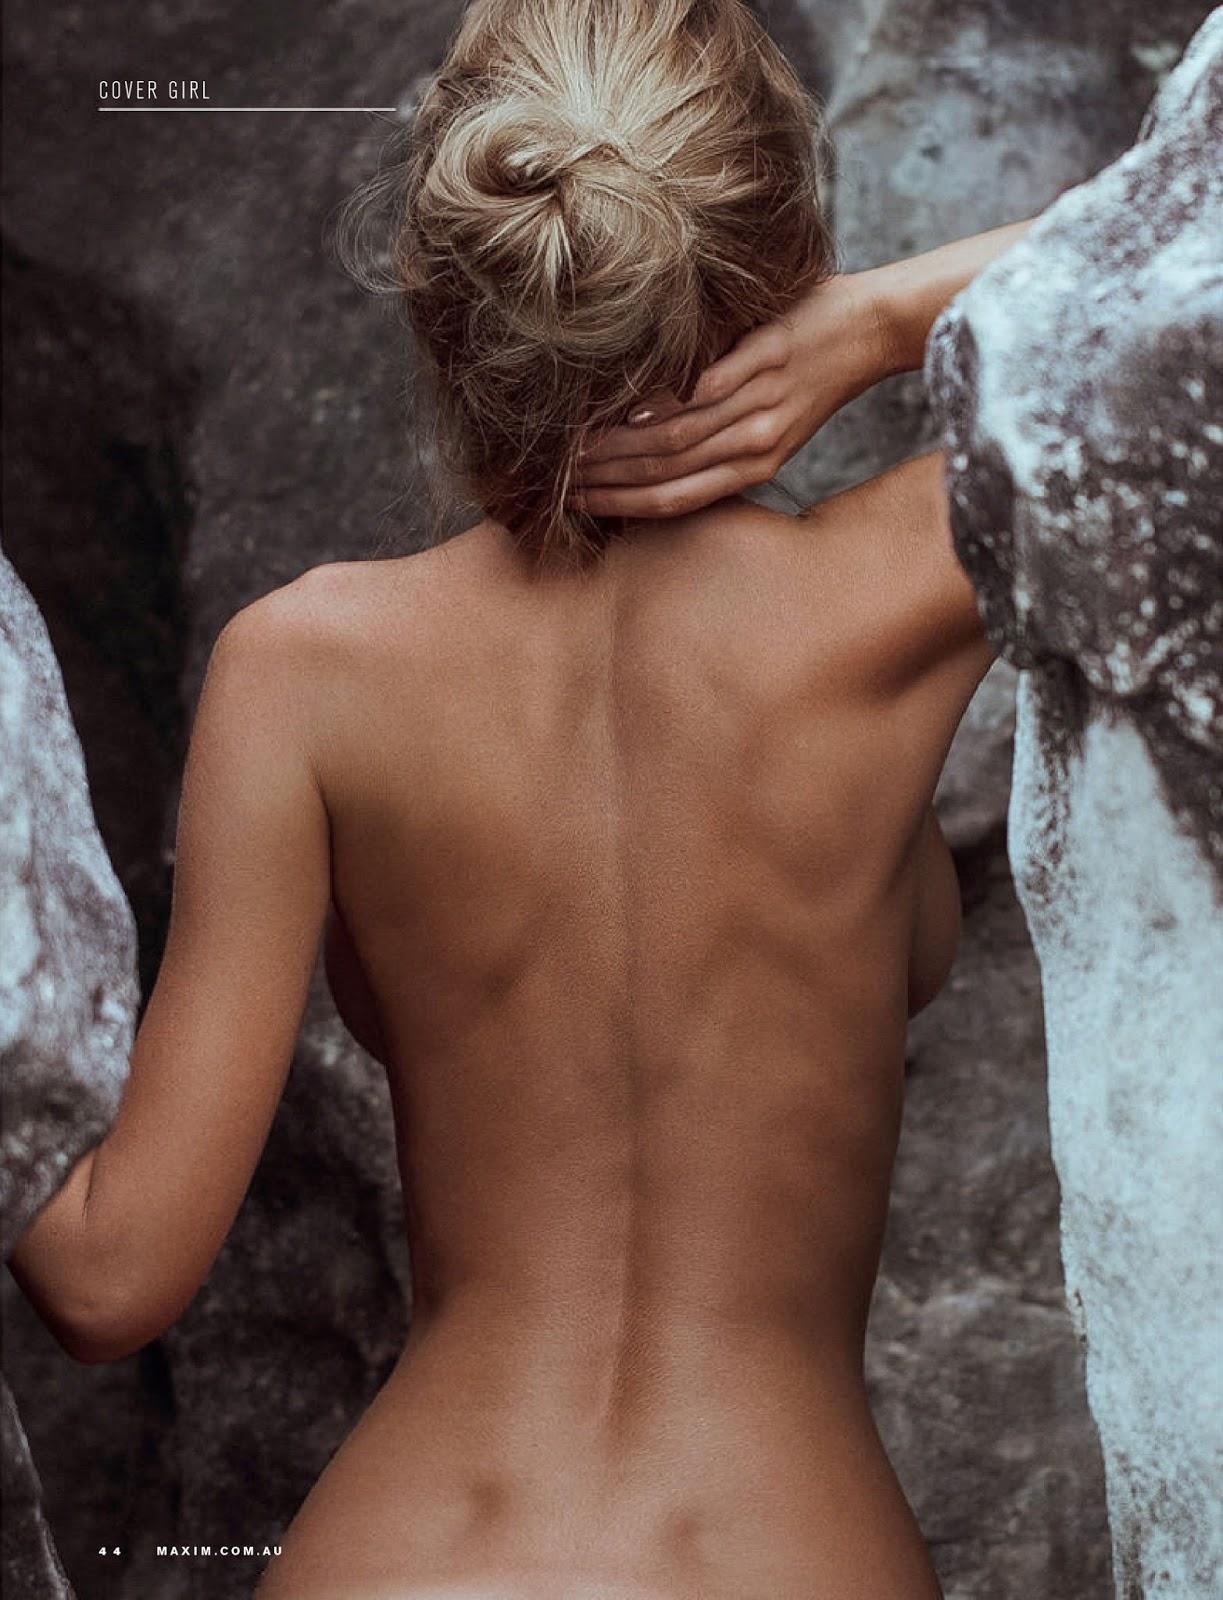 Renee somerfield sexy topless